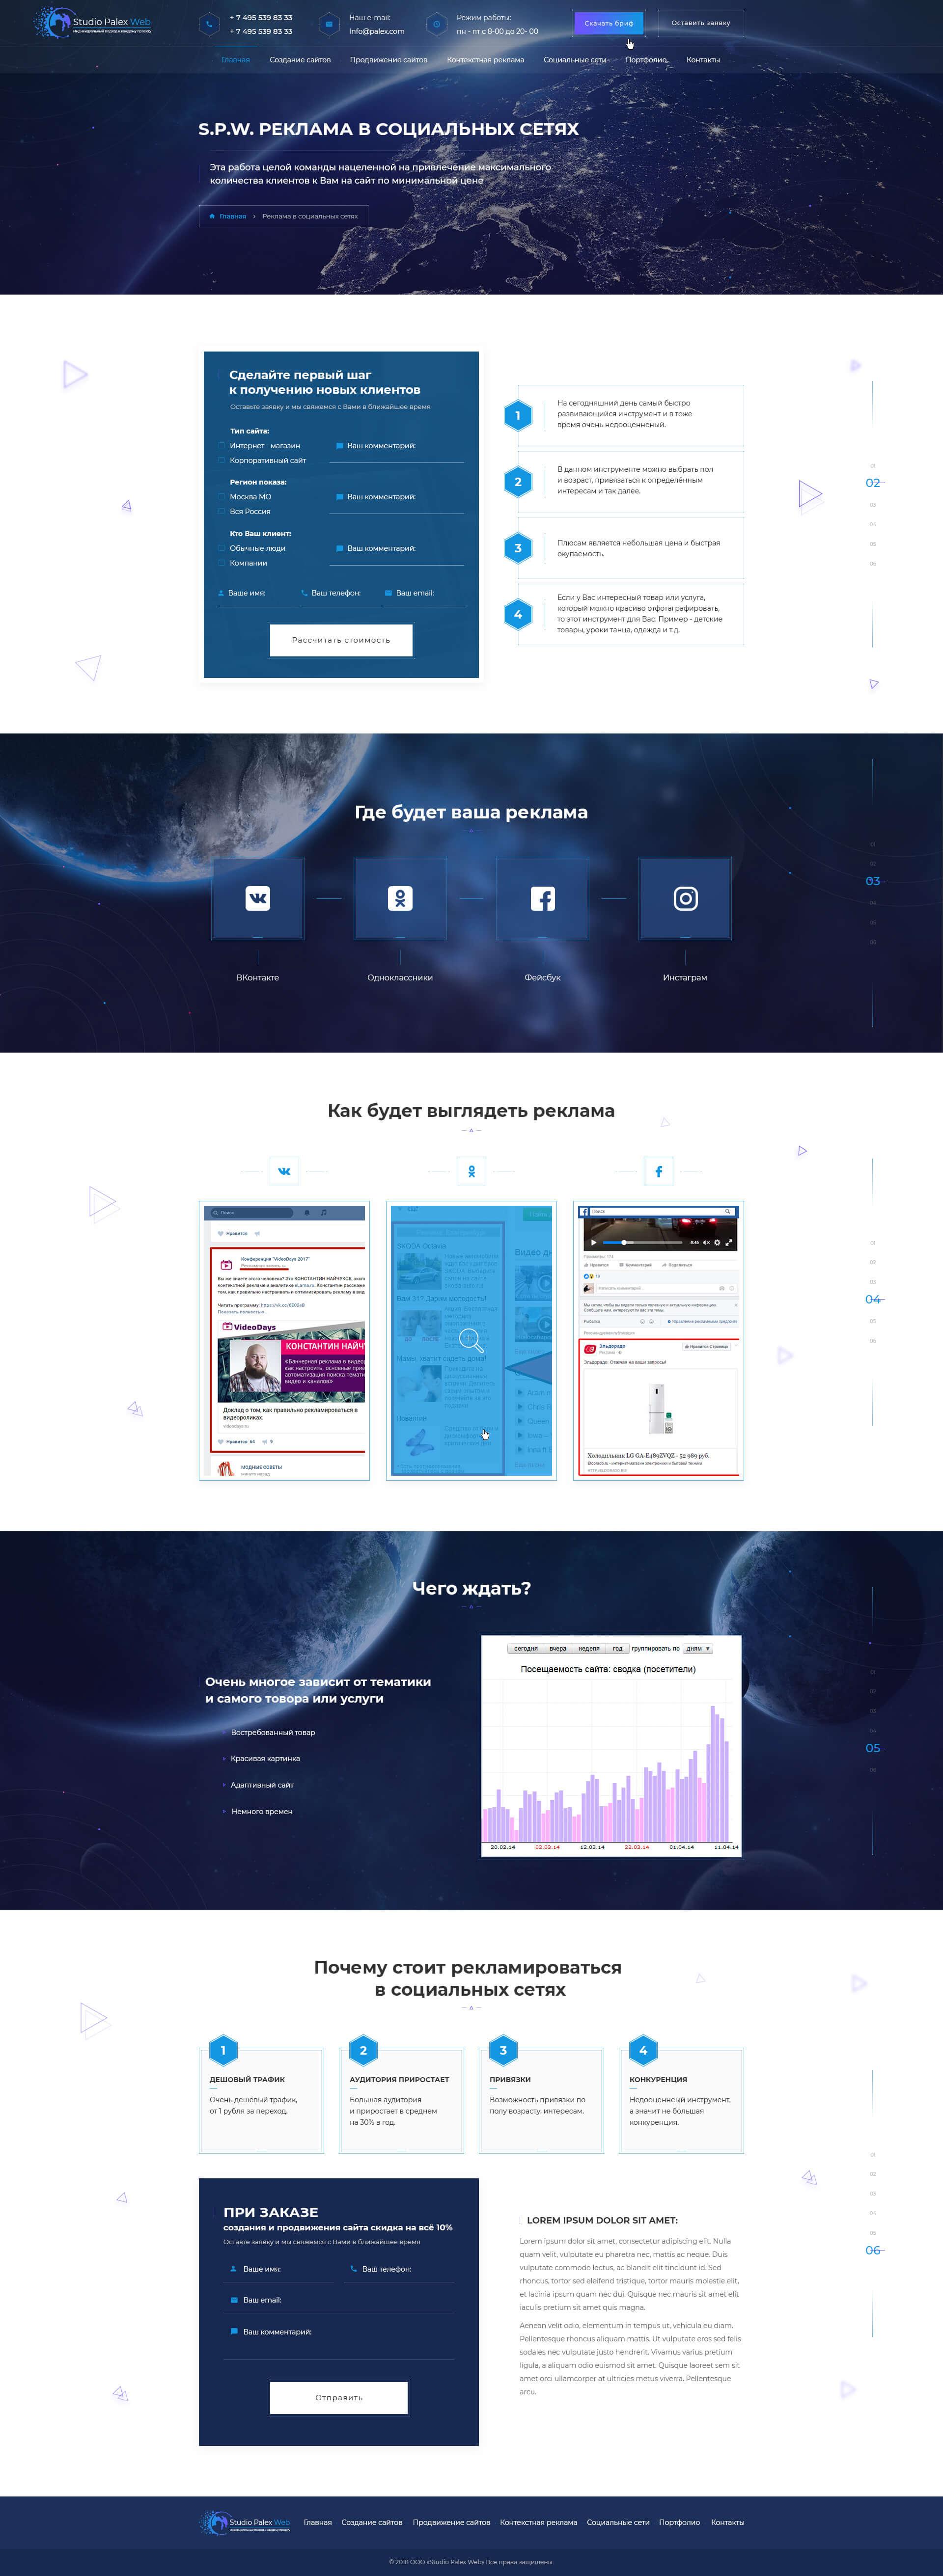 StudioPalexWeb_06_Advertising in social networks_0.4